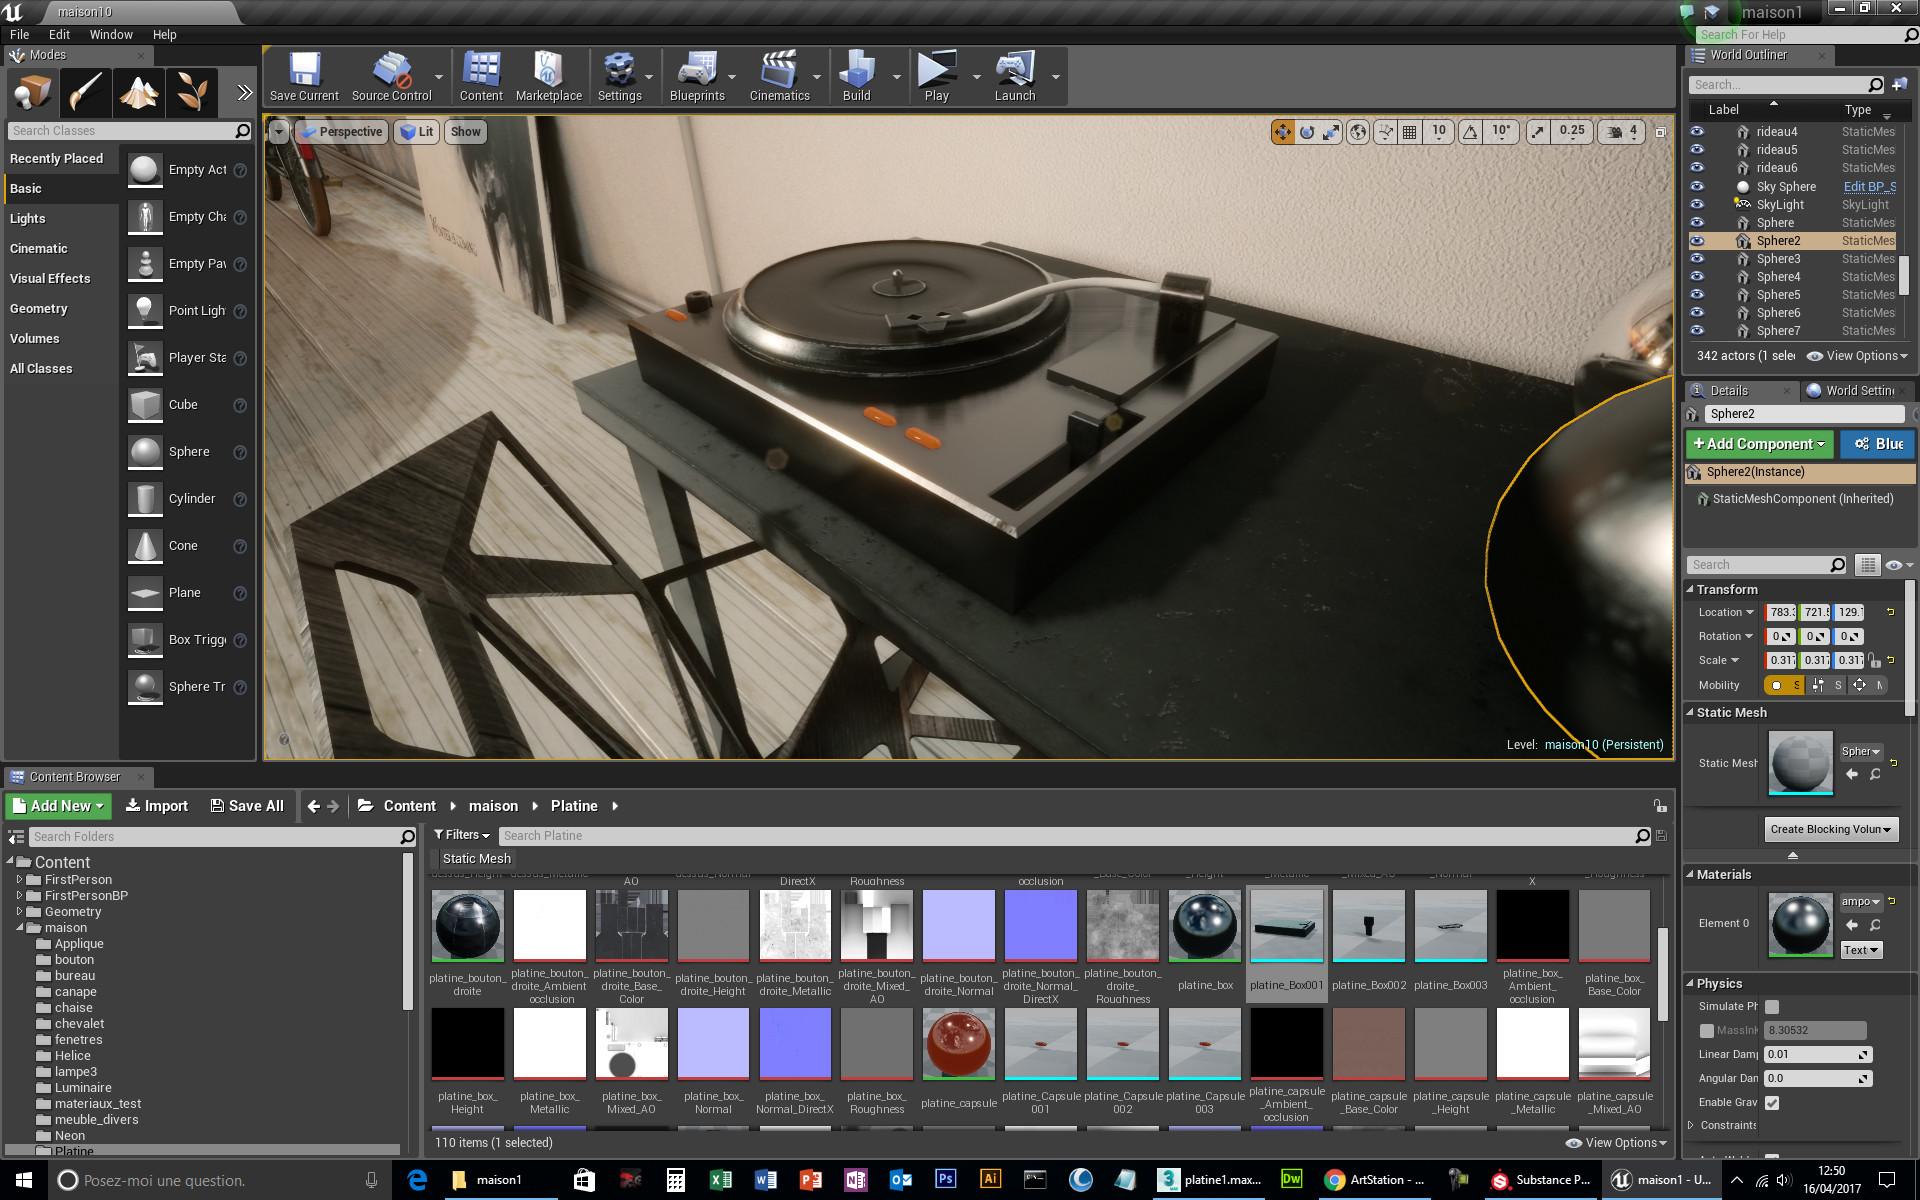 ArtStation - Workflow: 3dsmax / substance painter / Unreal